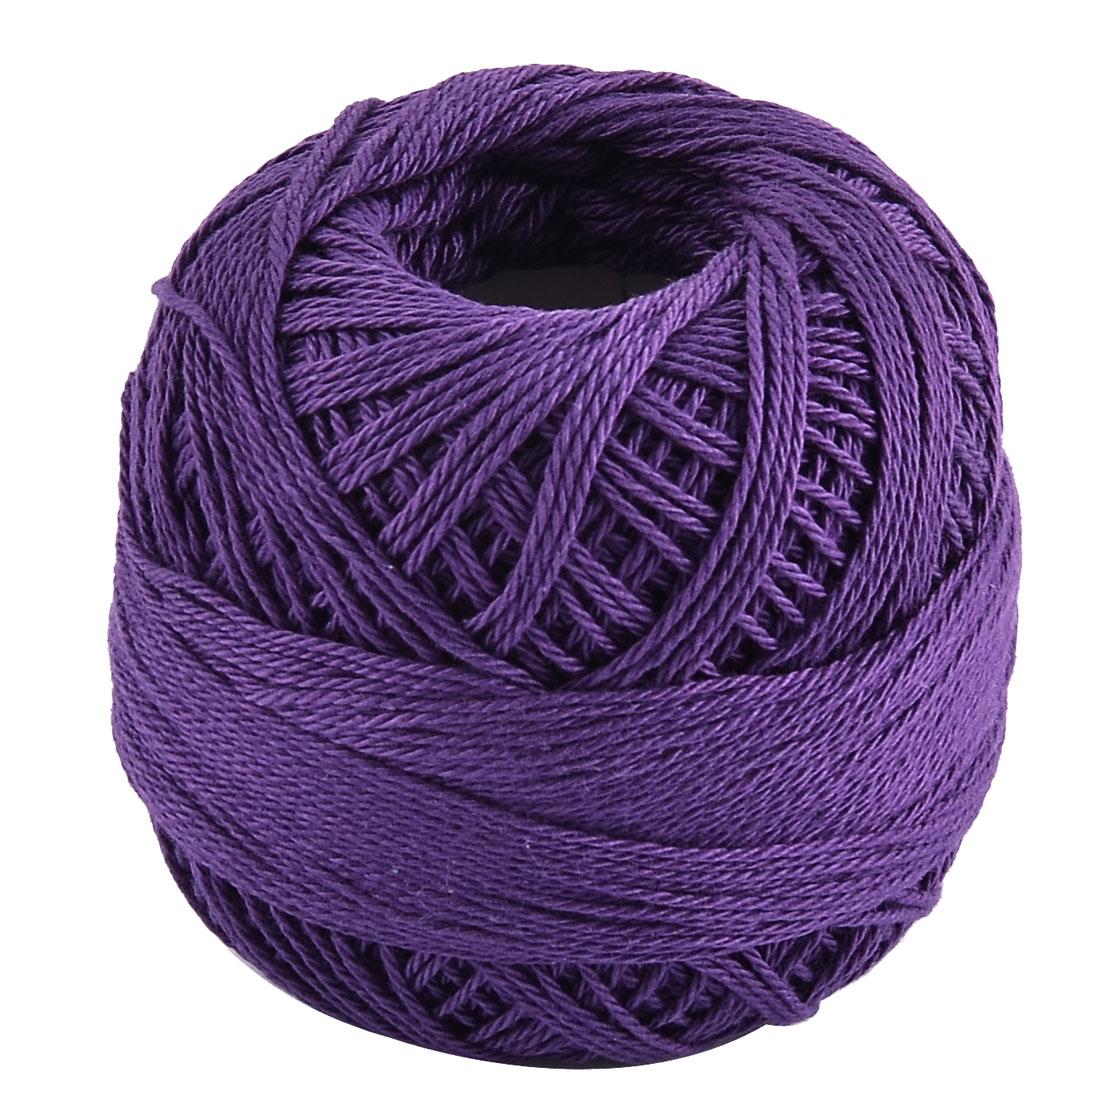 Cotton DIY Craft Hand Knitting Weaving Glove Shawl Sweater Yarn Thread Purple